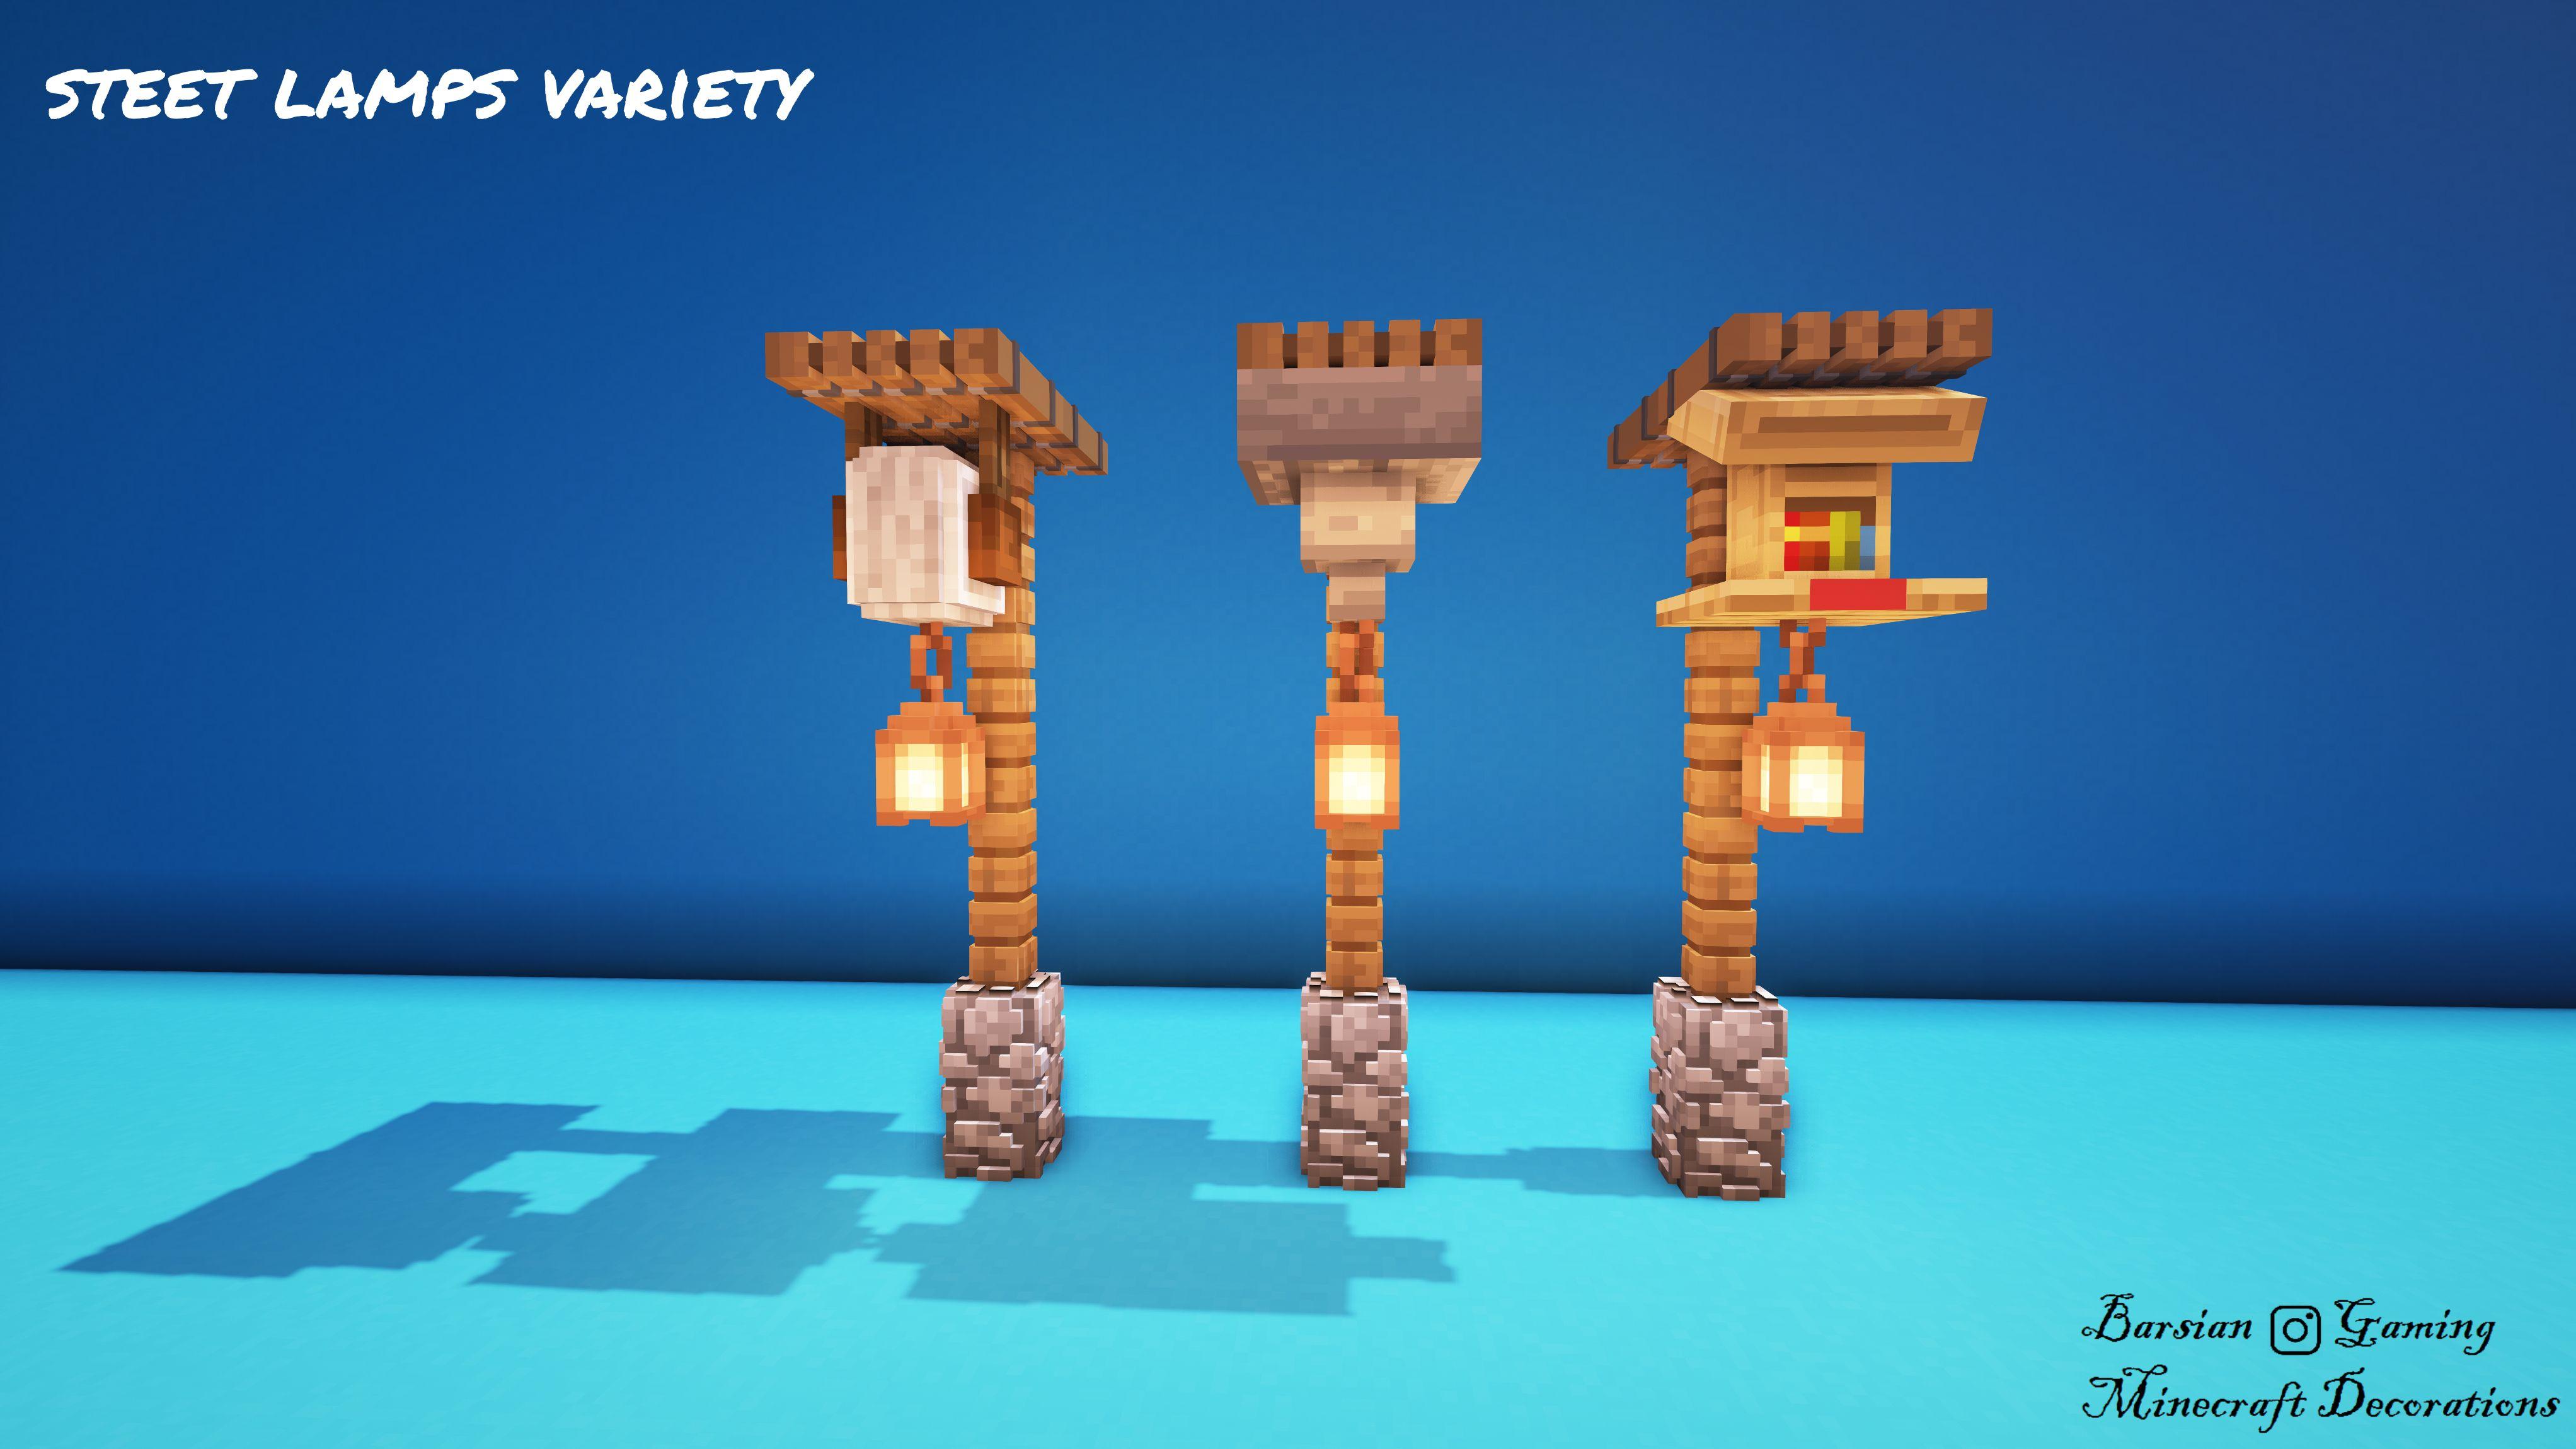 Street Lamps Variety In 2020 Minecraft Designs Minecraft Decorations Minecraft Creations